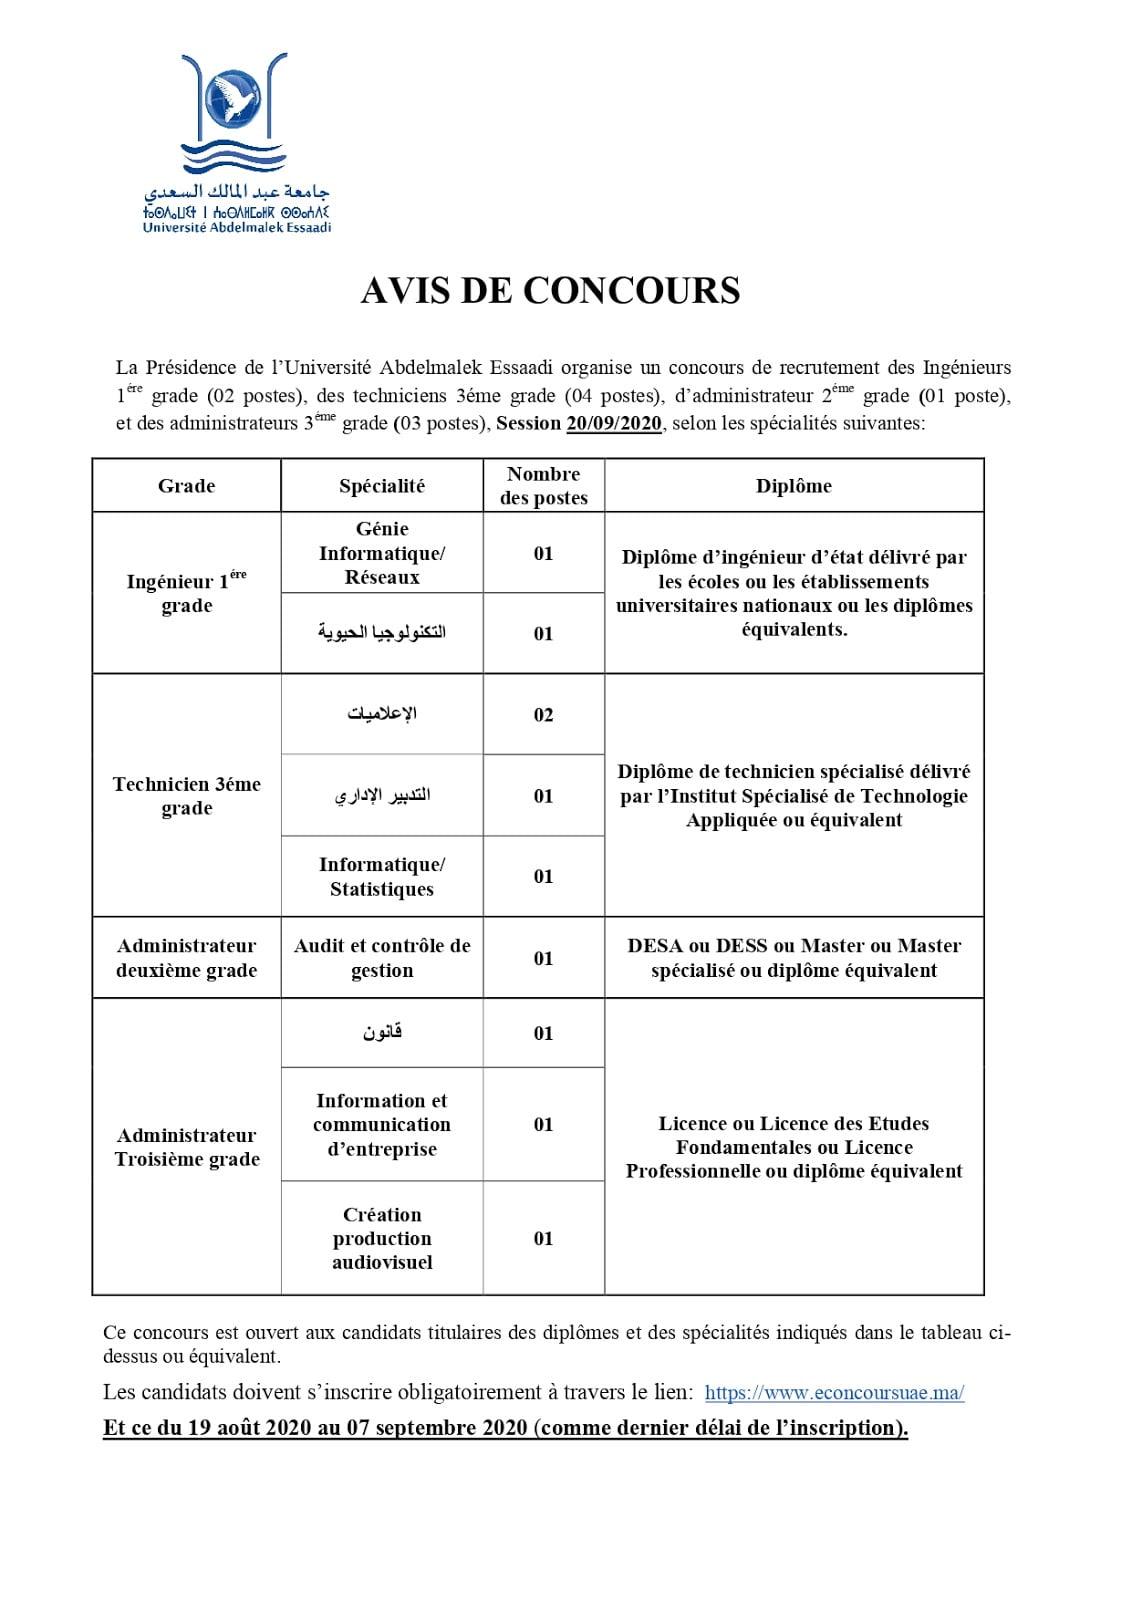 Concours Université Abdelmalek Essaâdi 2020 (10 Postes)